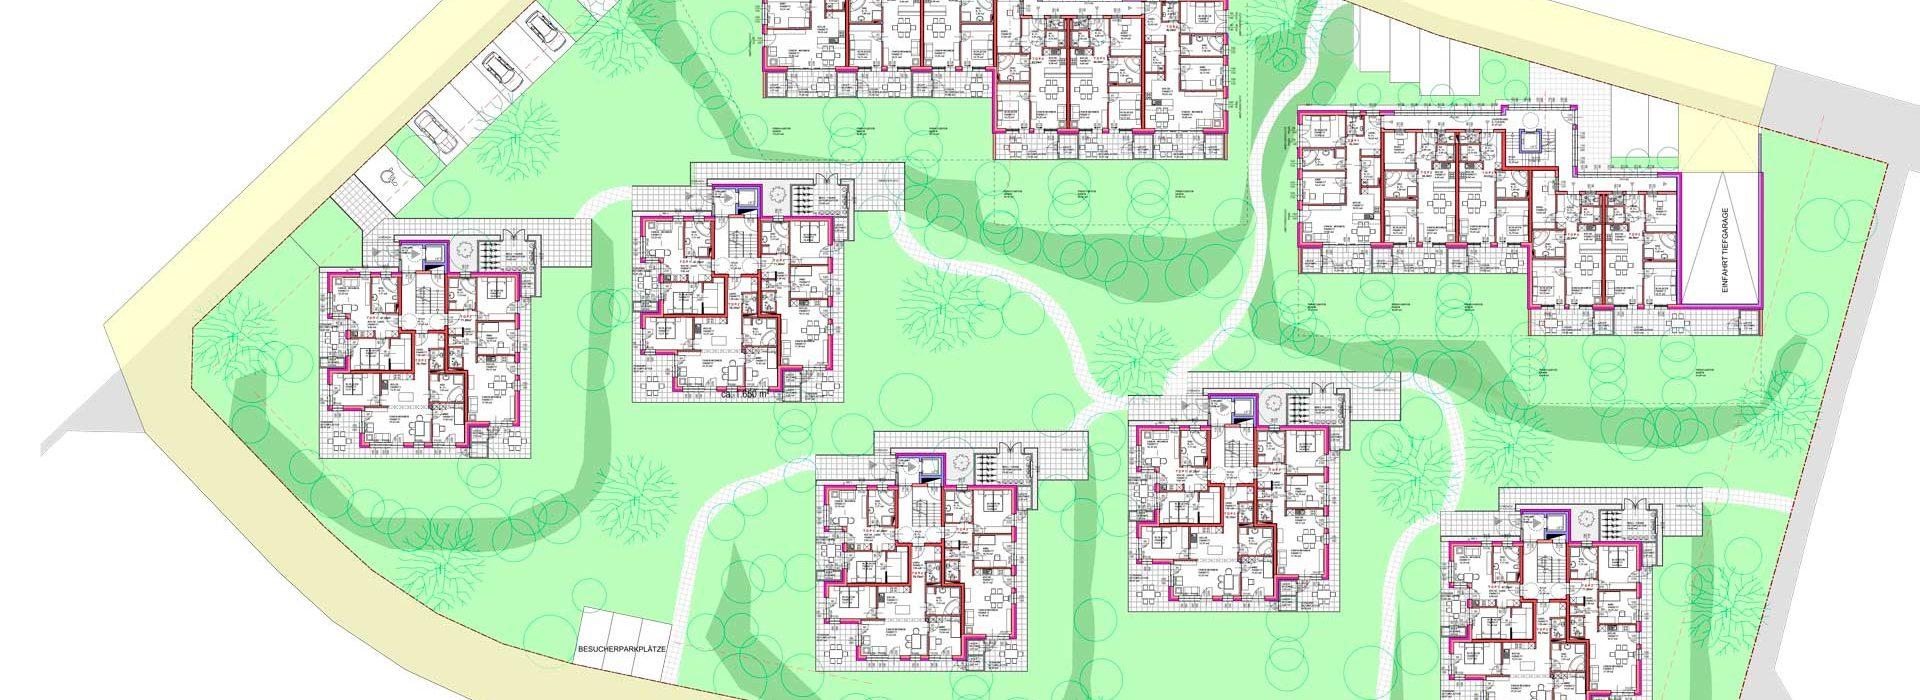 Wohnbebauung auf 10.000m²